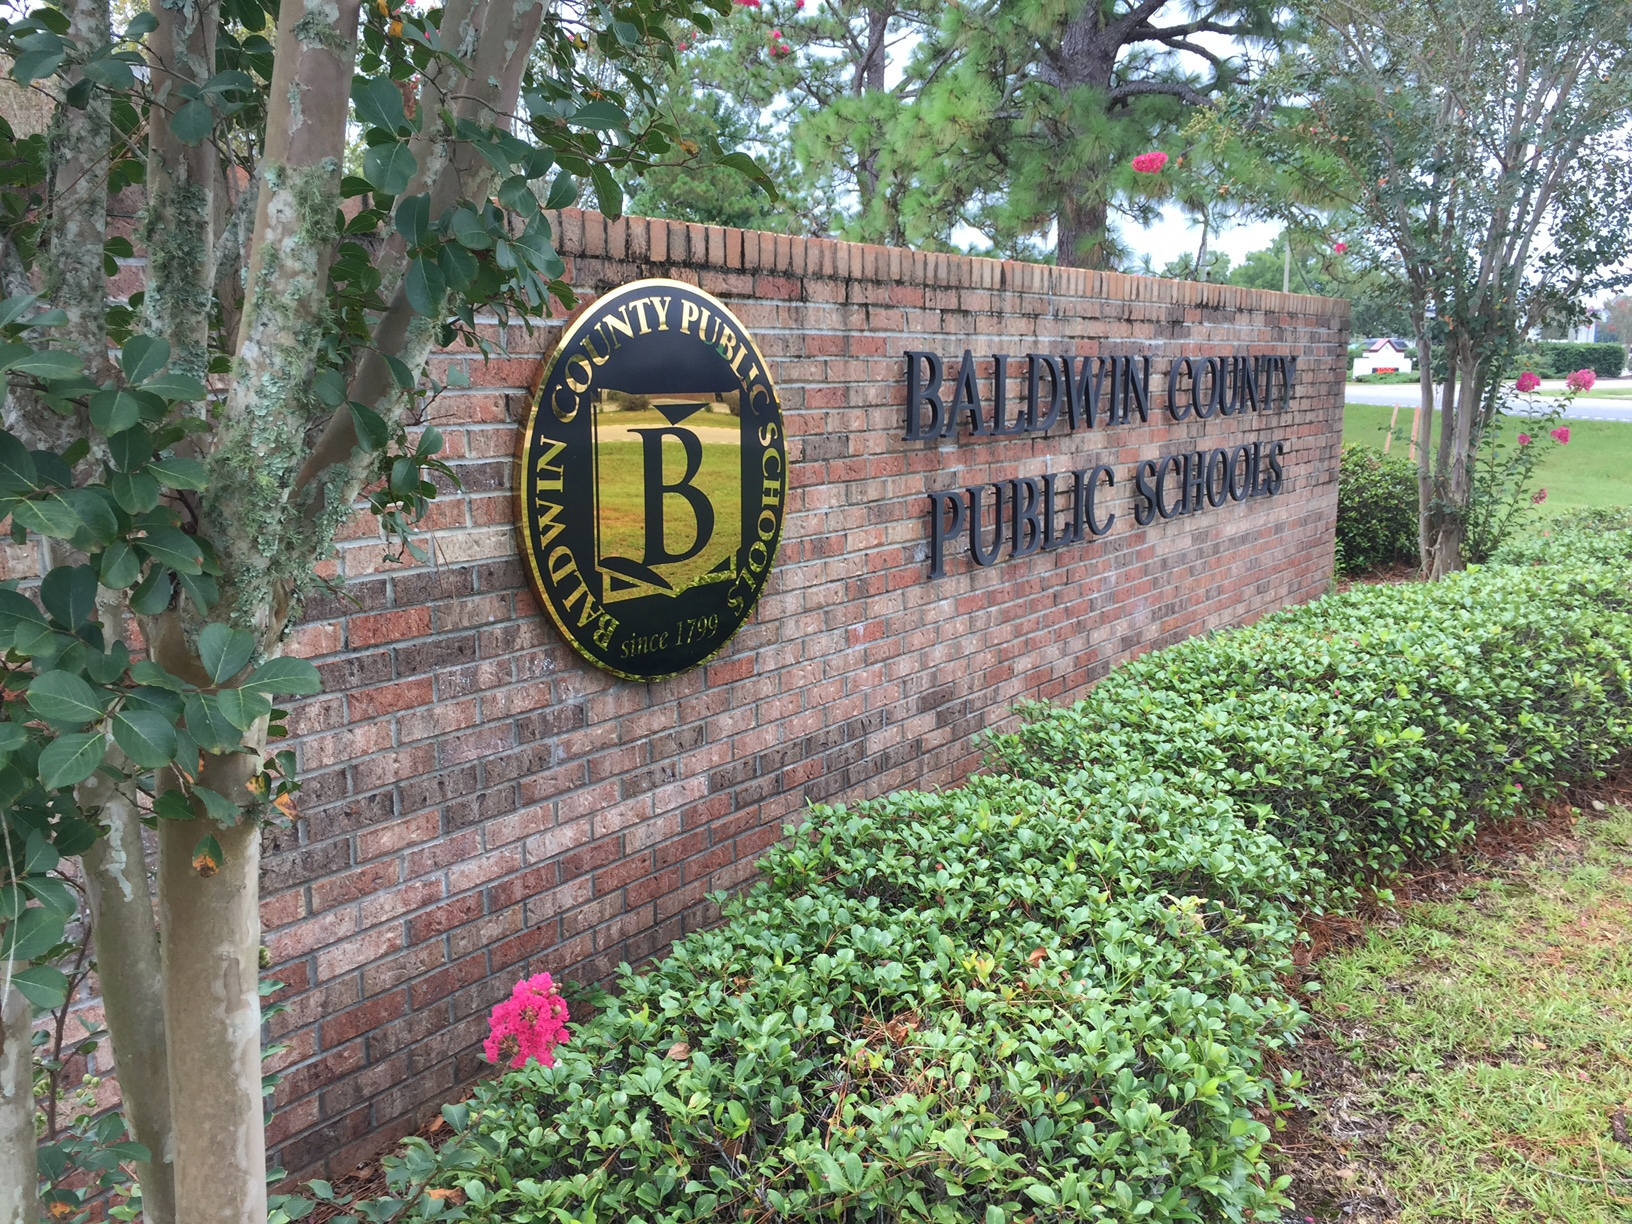 Baldwin County Board of Education_87346